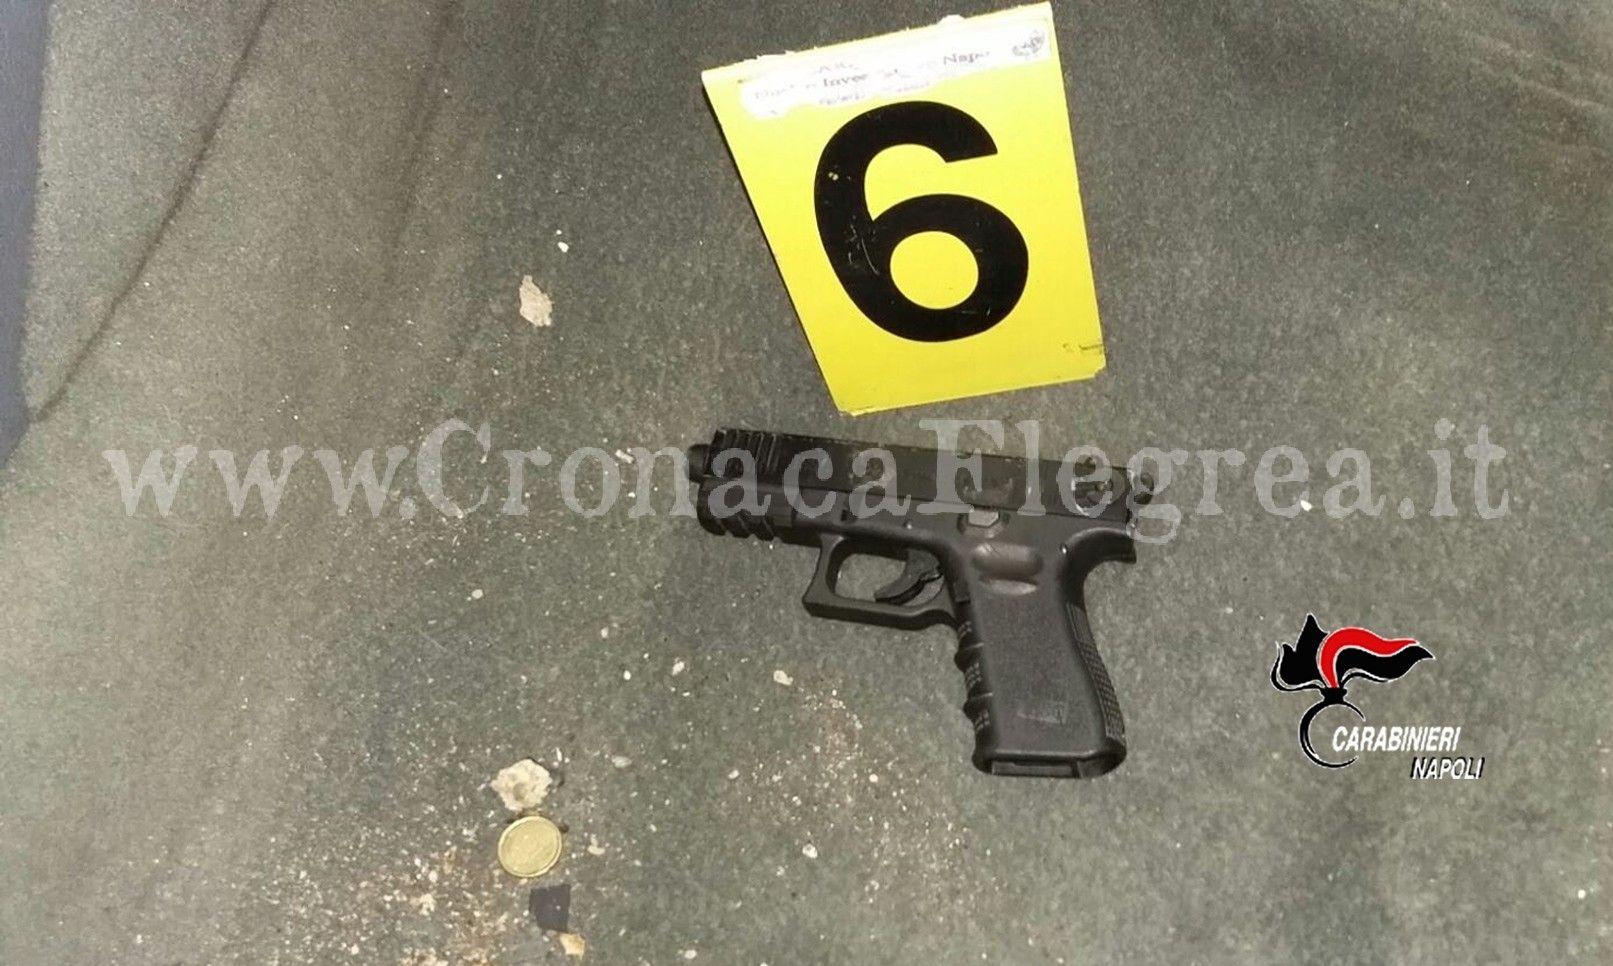 04-01-2017-indagini-rapina-trovata-arma-1